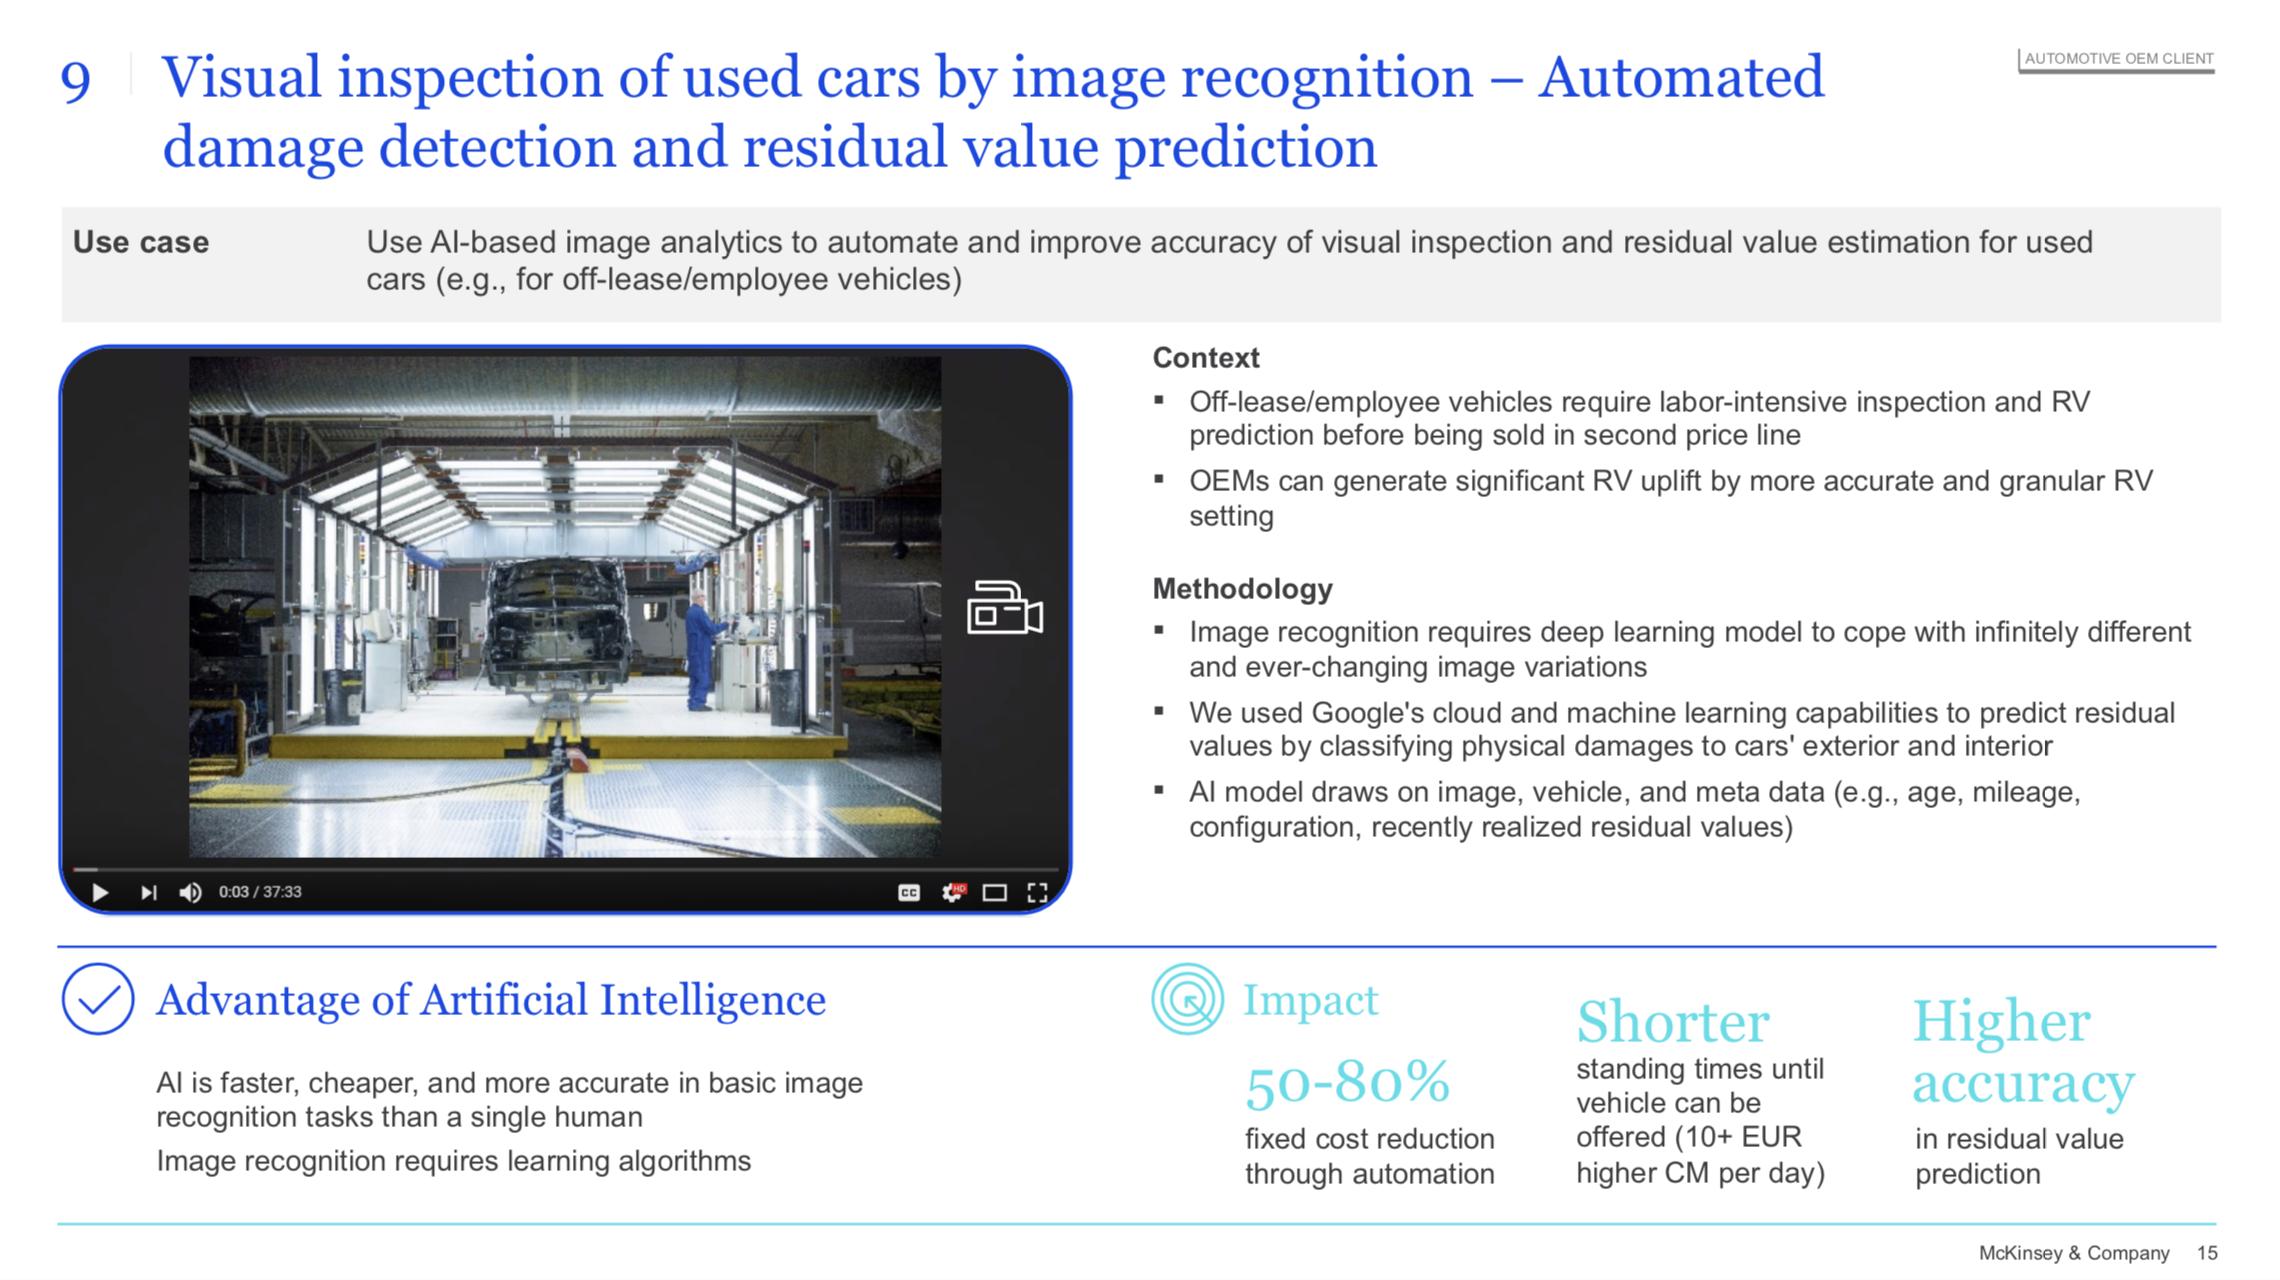 Norbert Biedrzycki Artificial Intelligence presentation 10